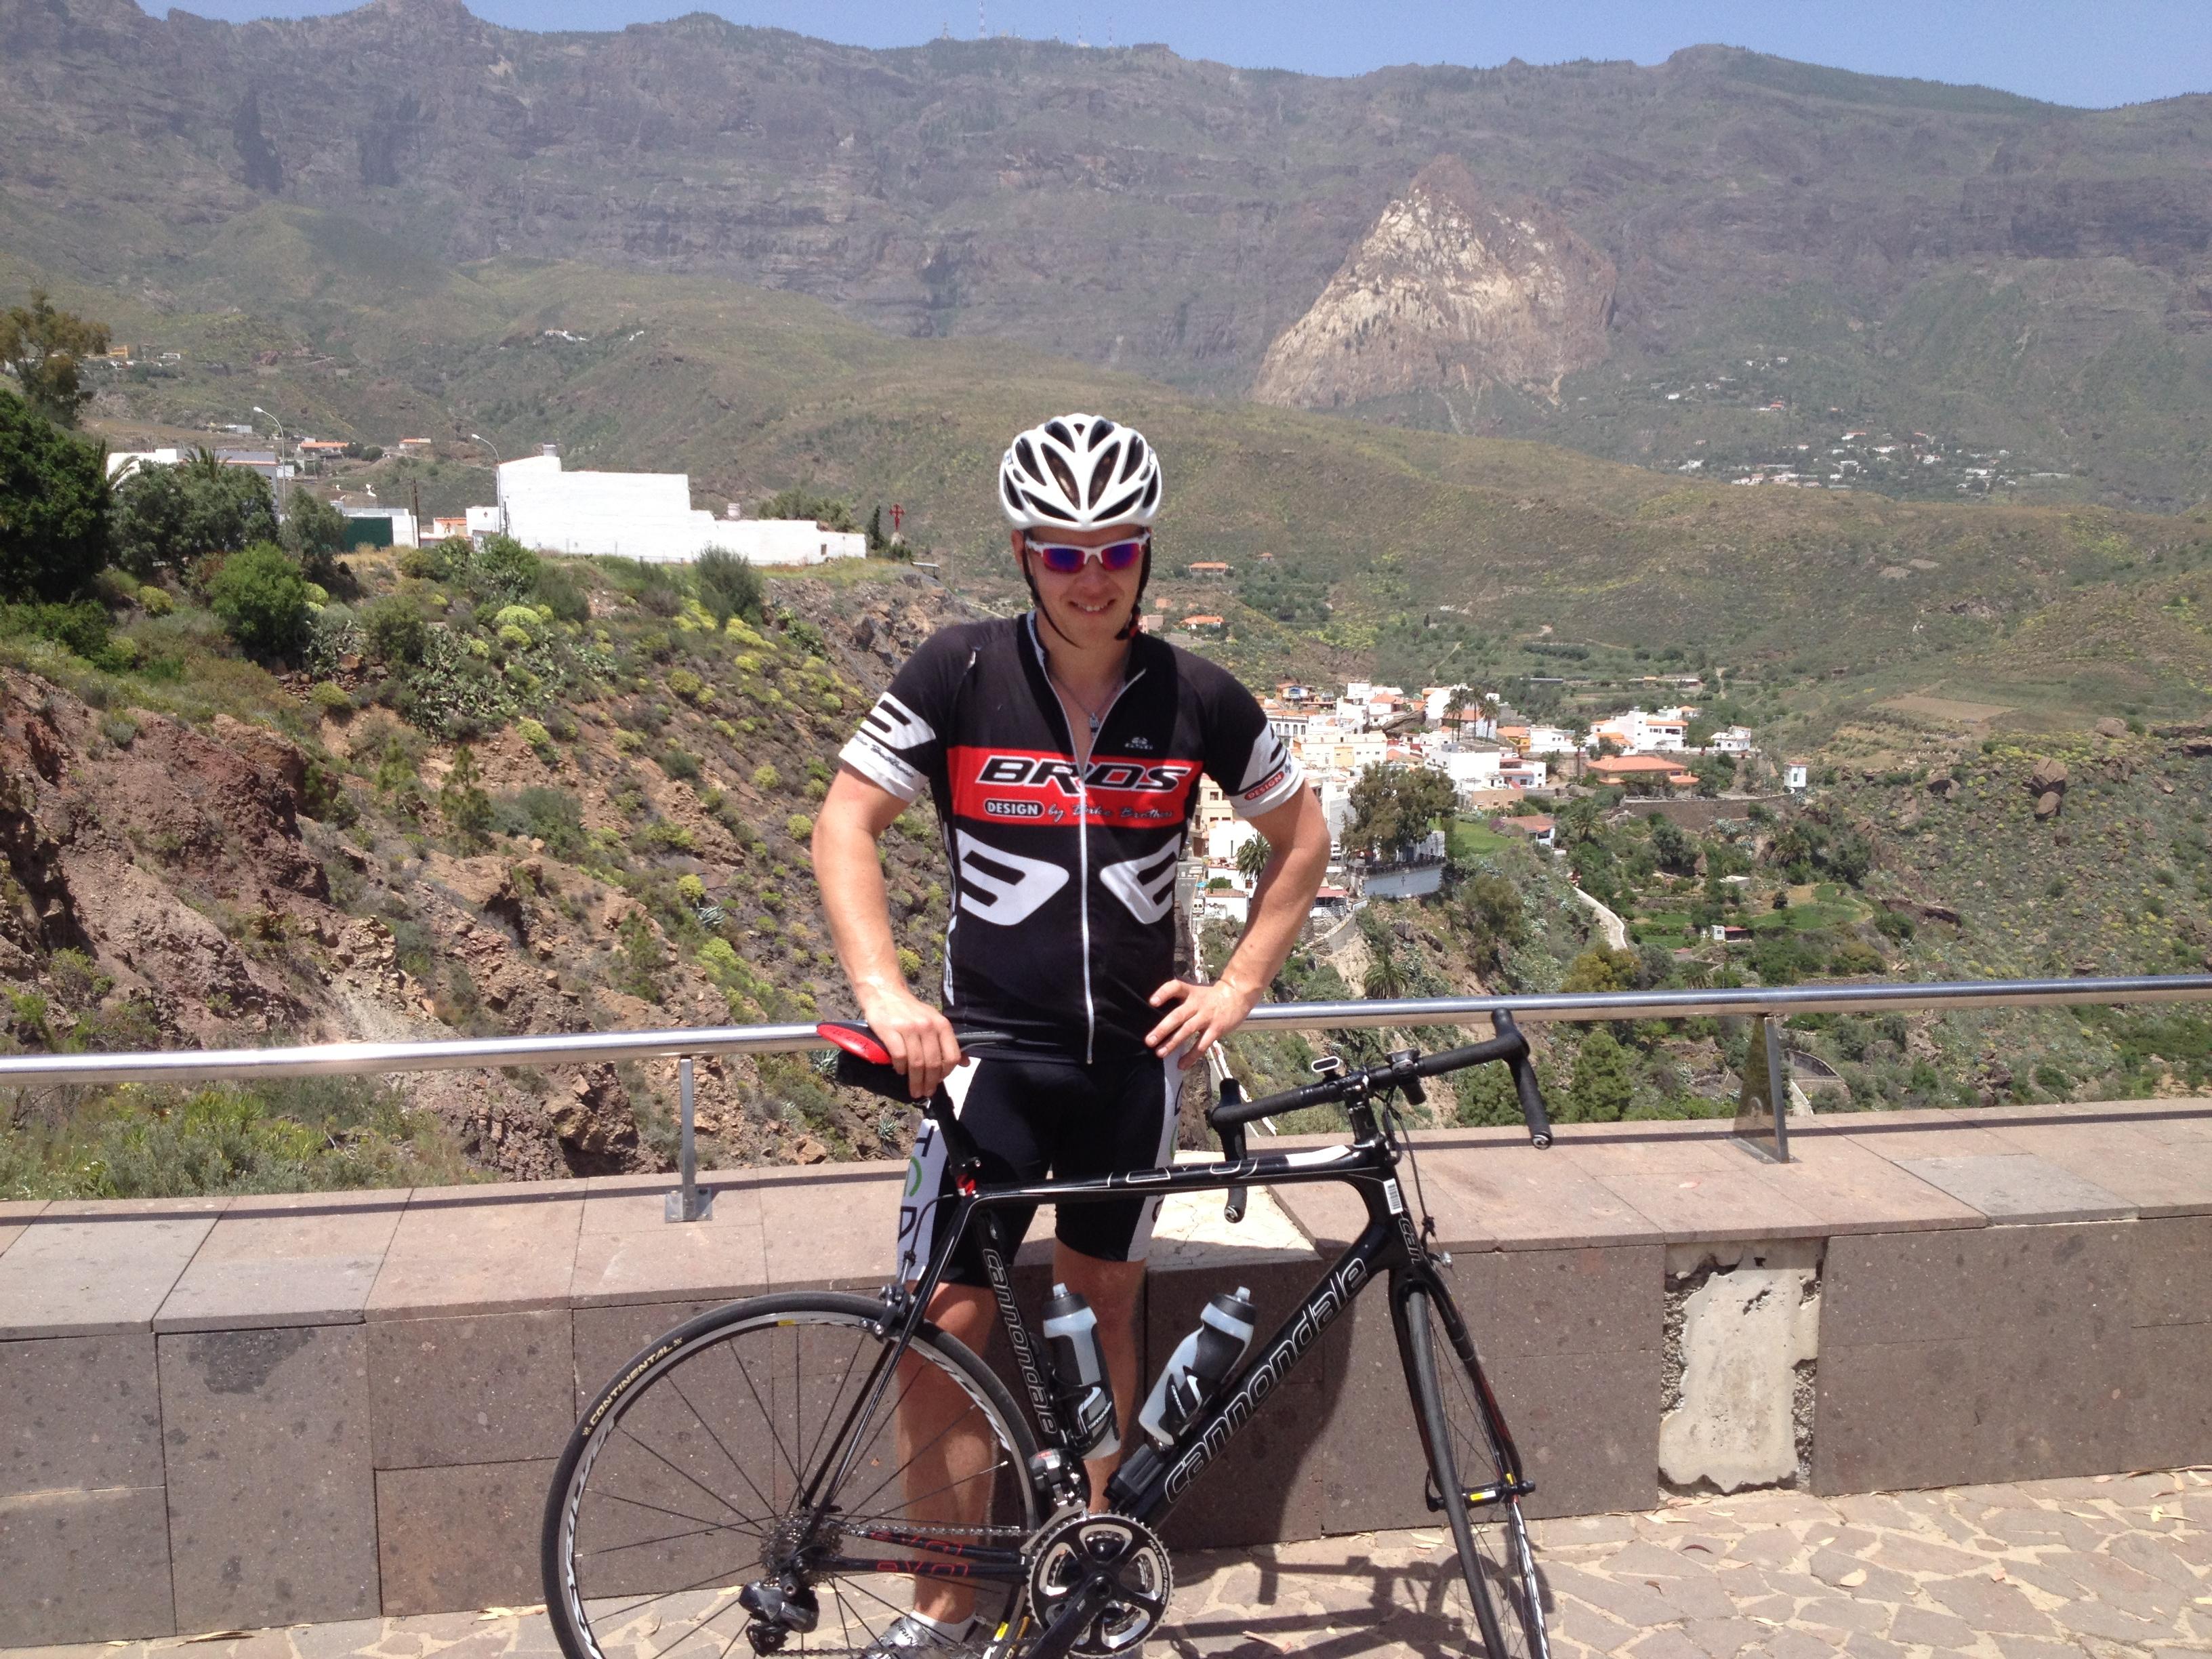 Gran Canaria – Dag 5: Ut på tur alene